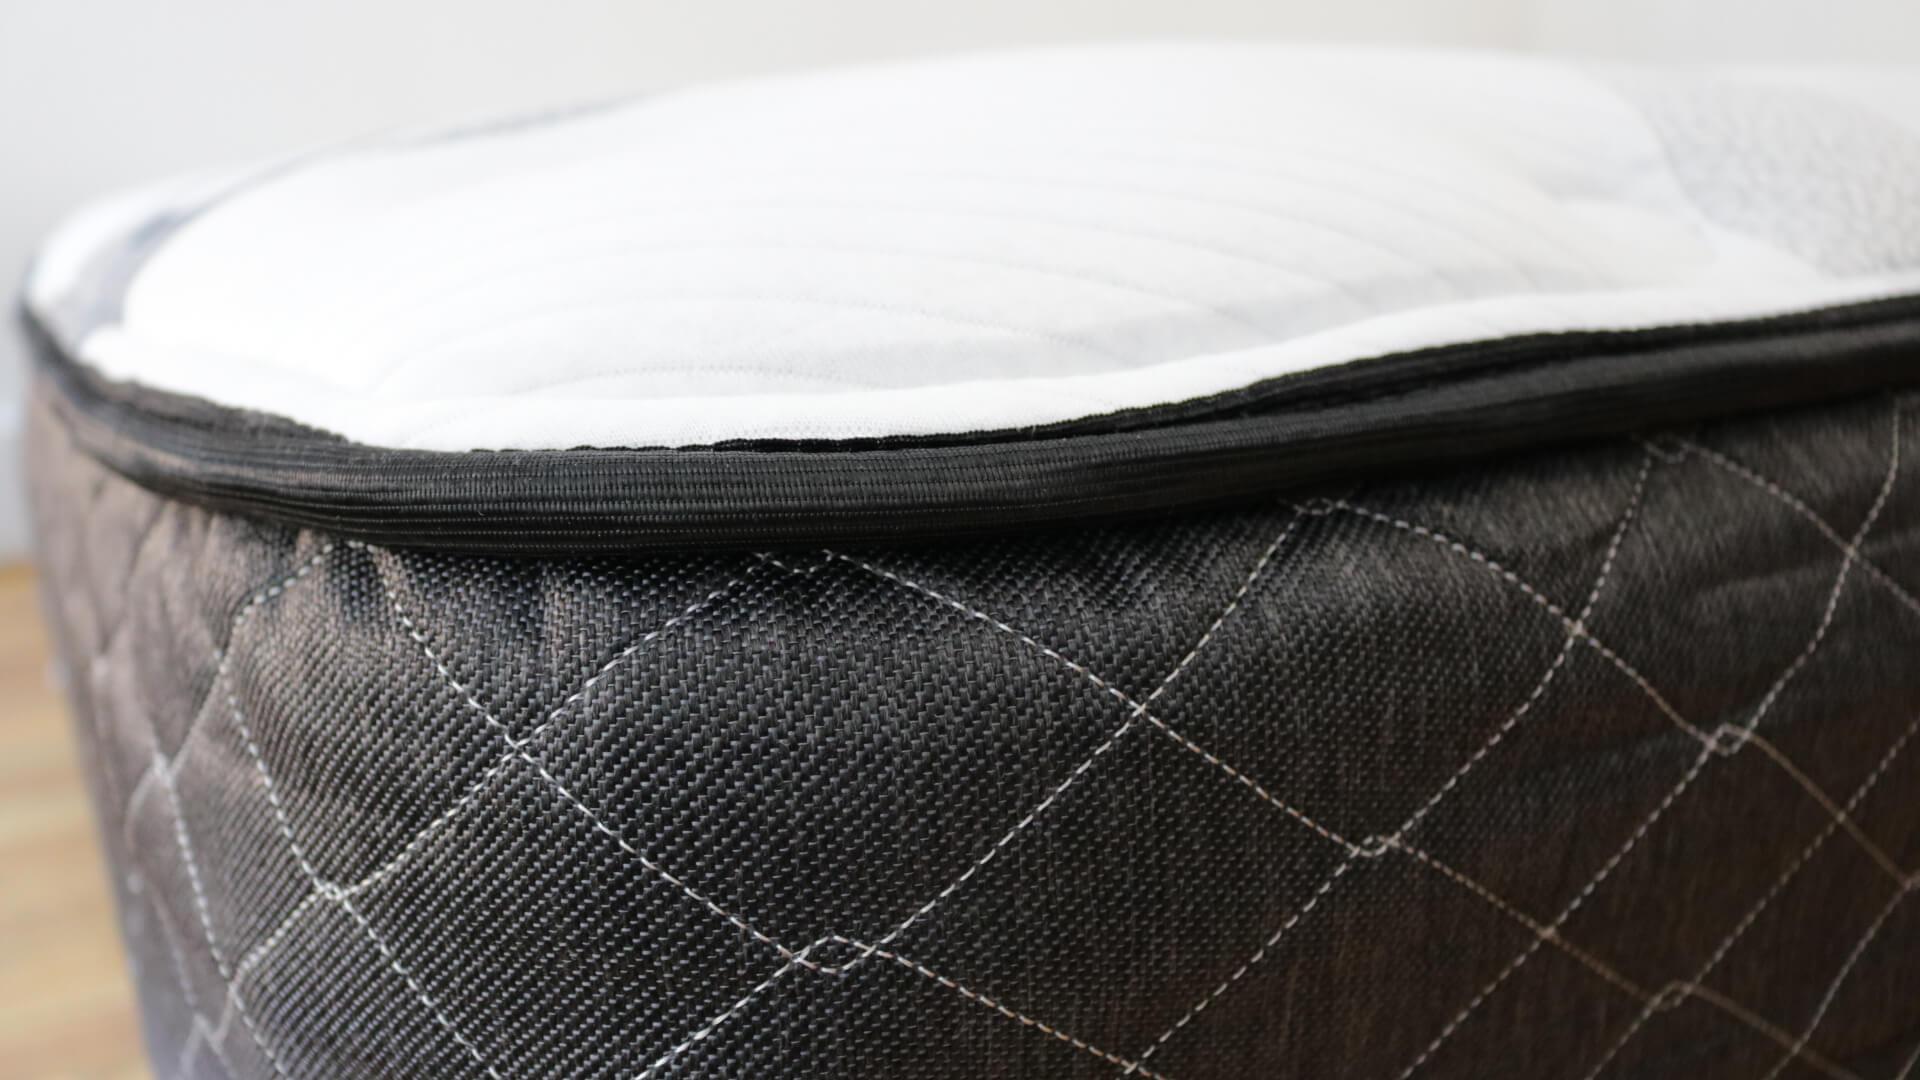 luft mattress review luft review mattress reviews online mattress reviews 2 girl on the. Black Bedroom Furniture Sets. Home Design Ideas